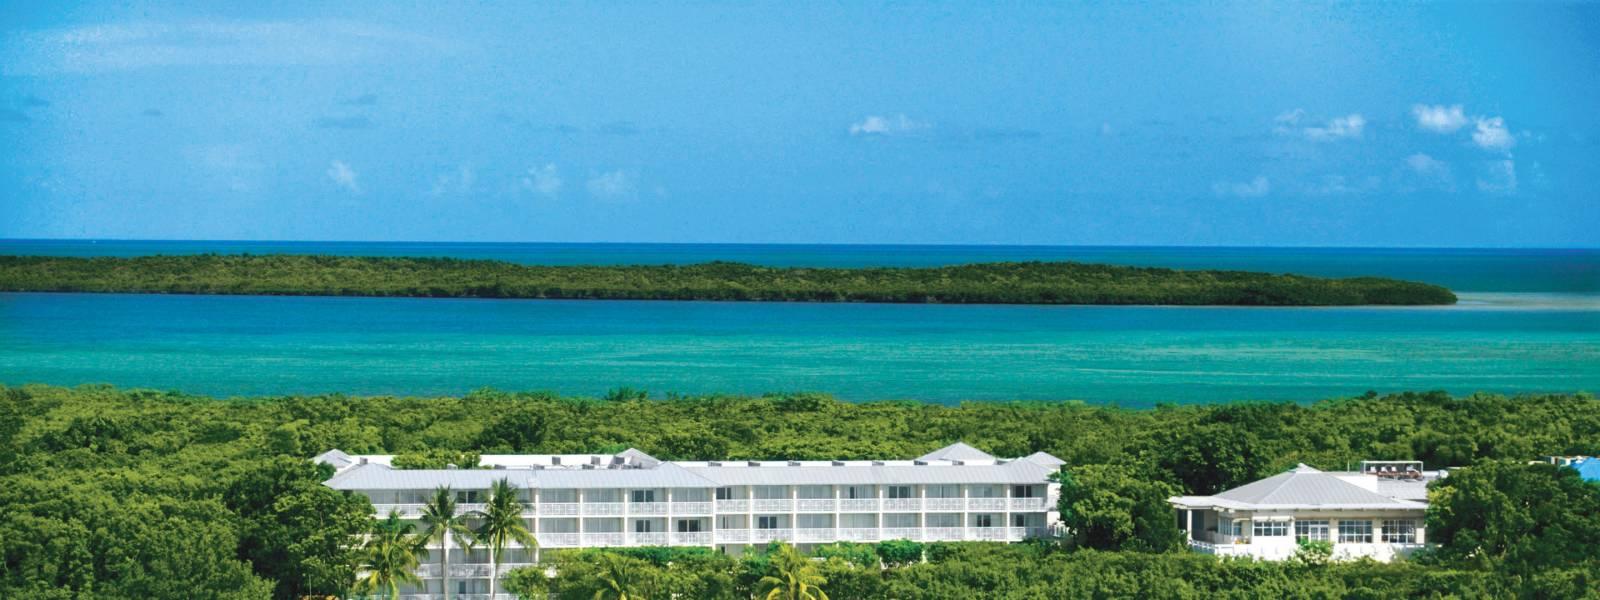 Hilton Key Largo